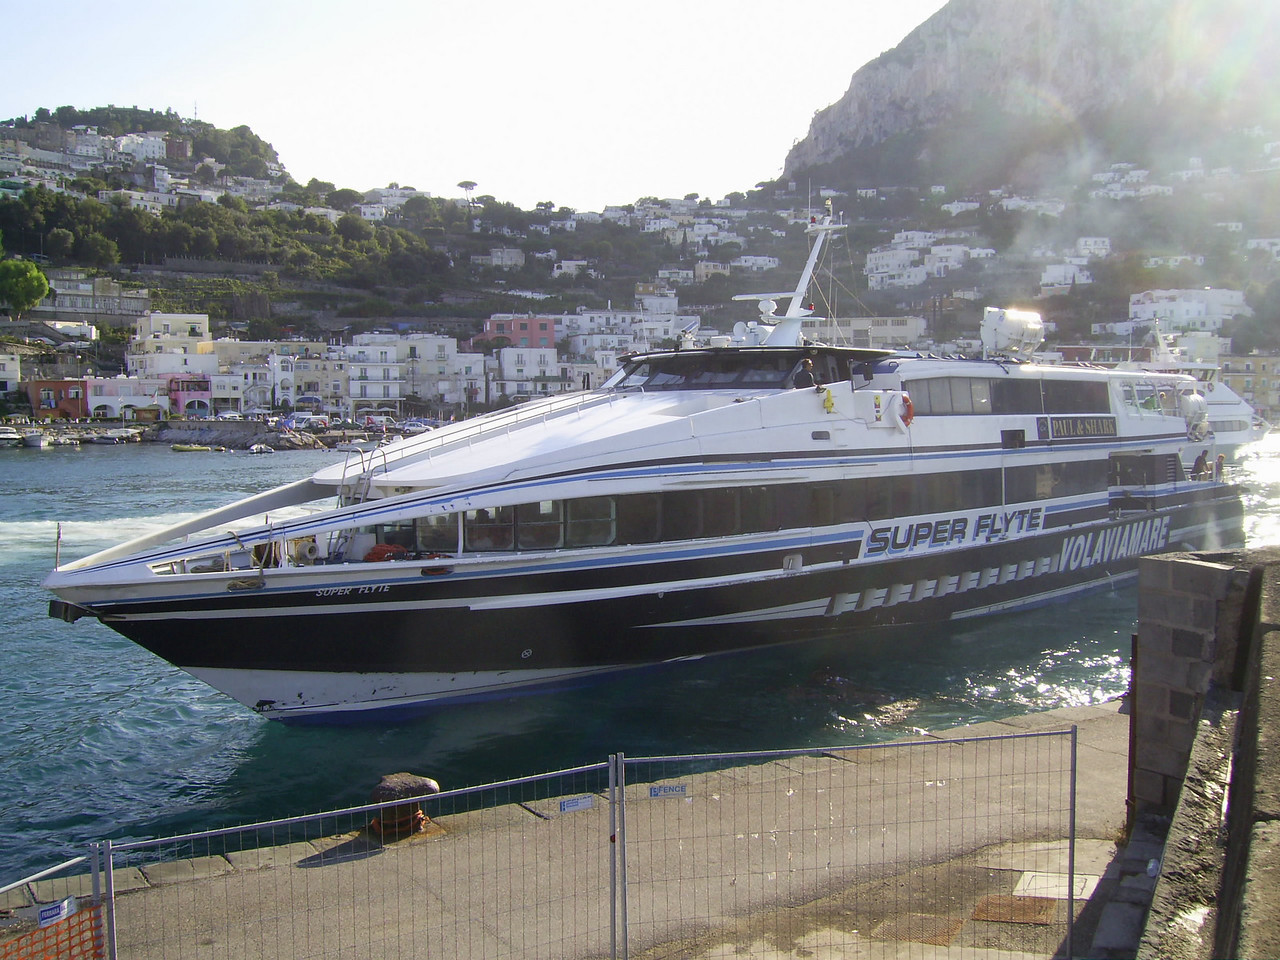 HSC SUPER FLYTE unmooring in Capri.